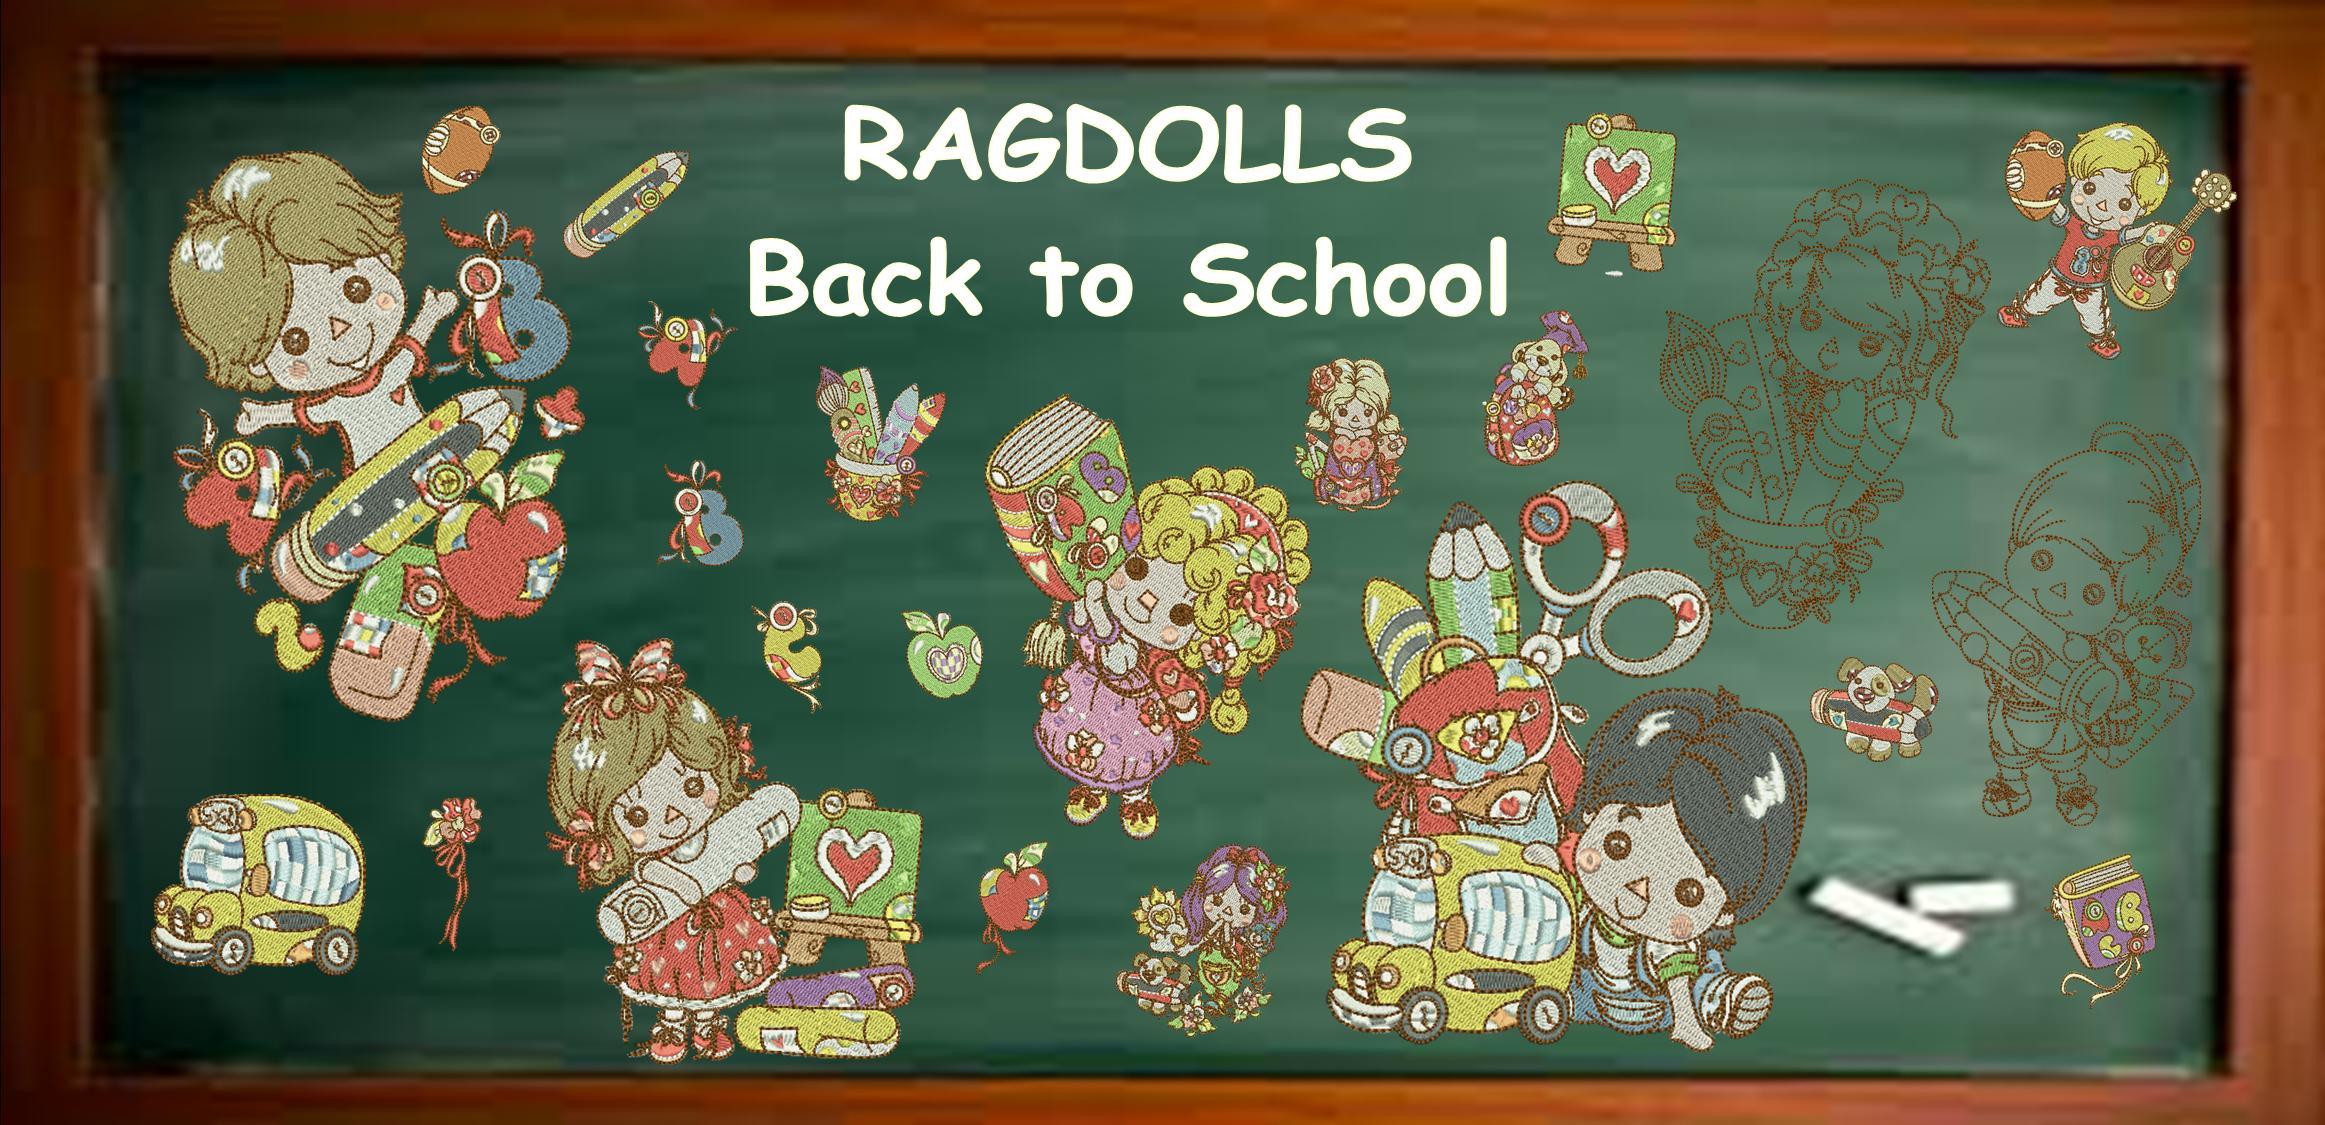 RAGDOLLS BACK TO SCHOOL  Banner